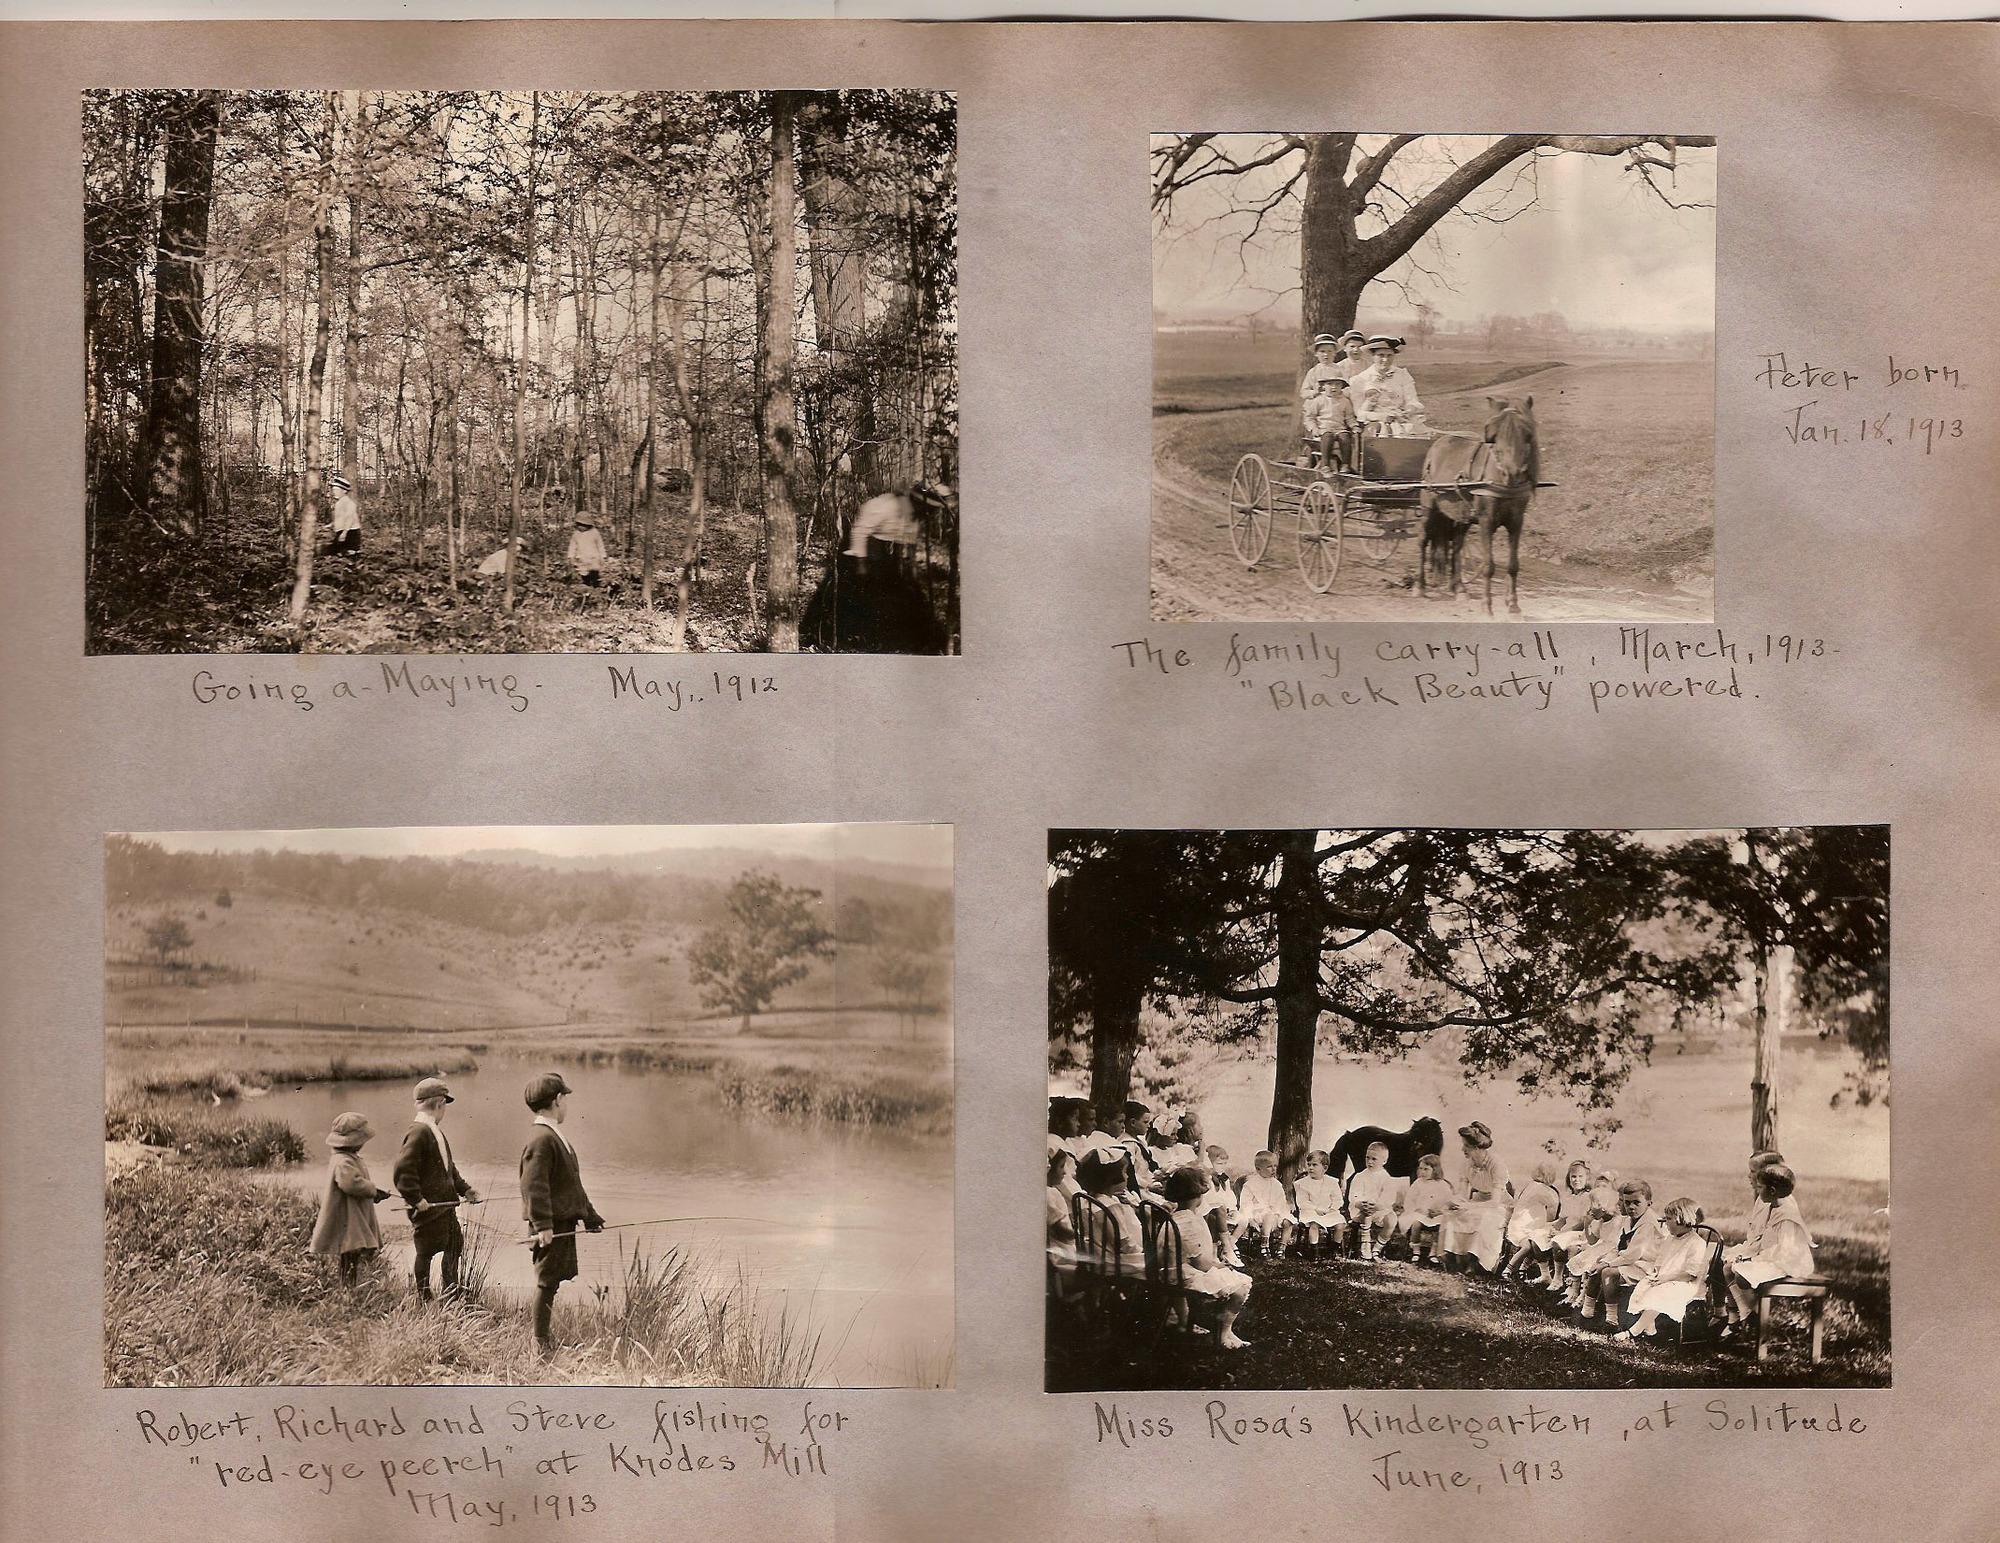 Fletcher_RFletcherPhotos_ScrapbookPage07_1912-1913.jpg